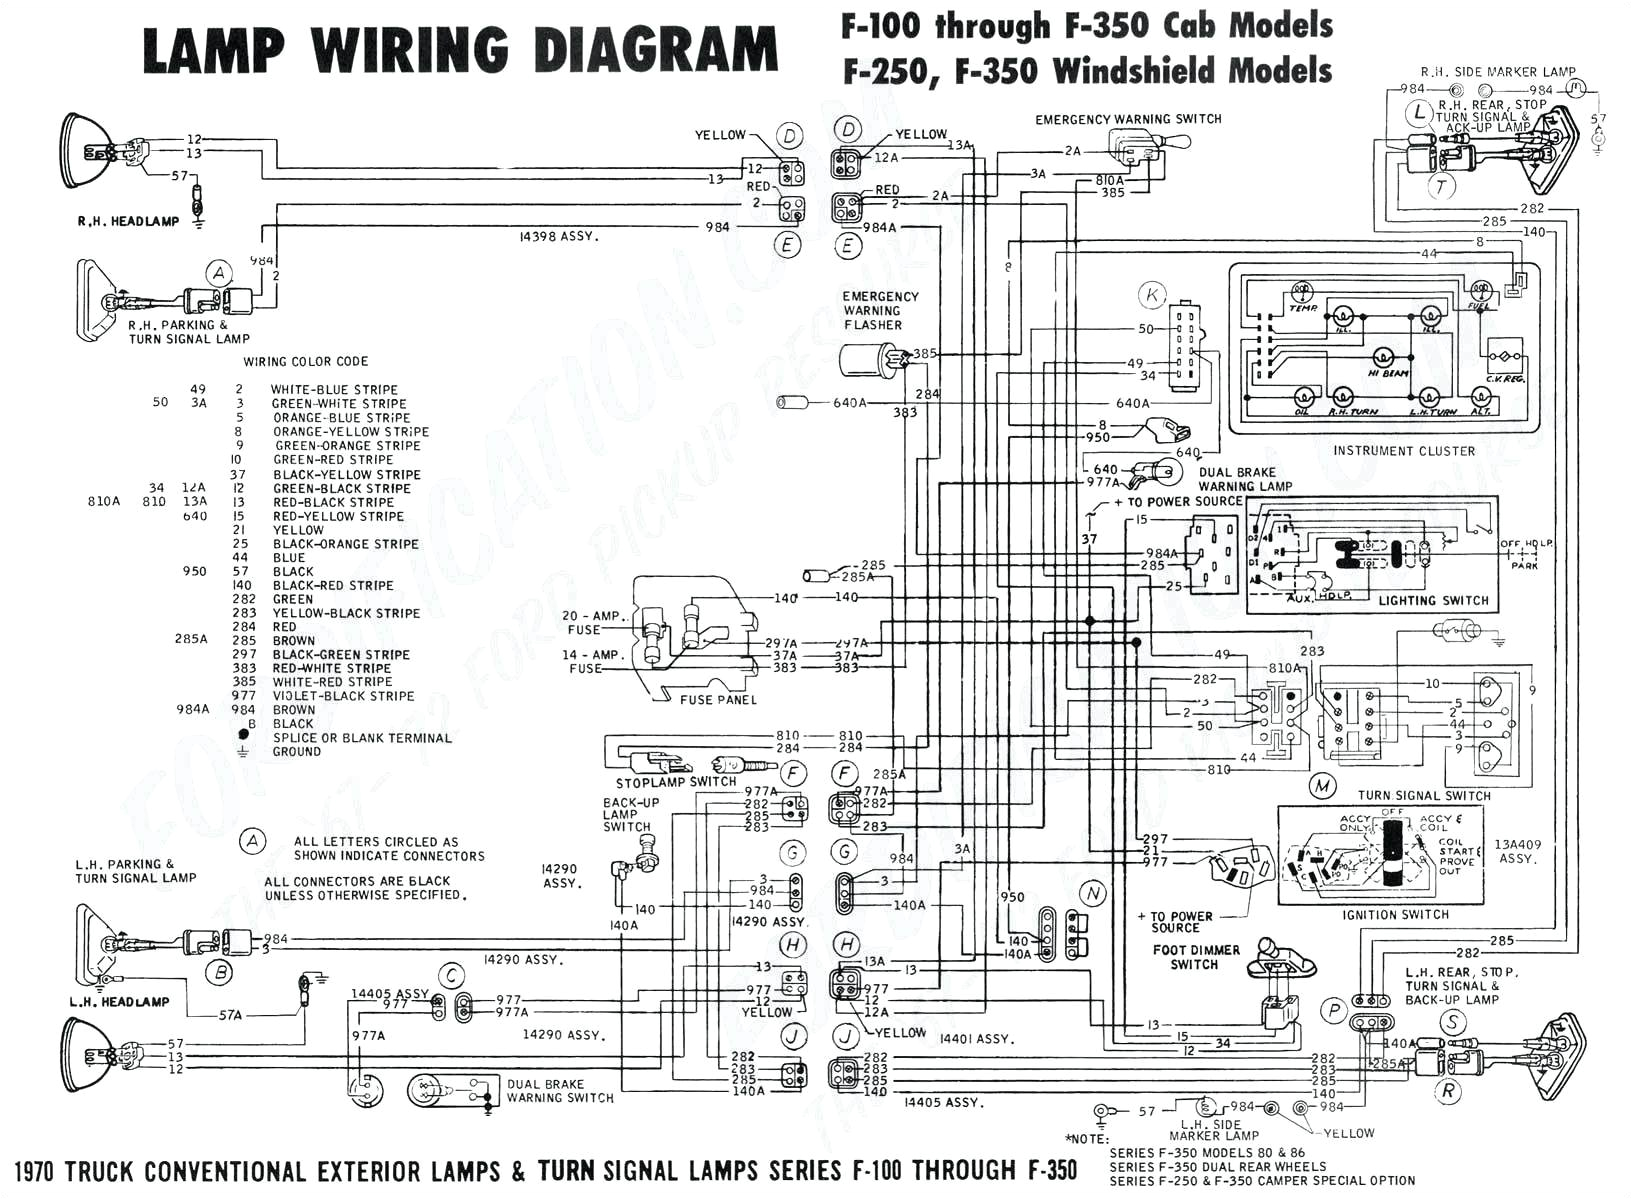 wiring diagram 2003 dodge ram 2500 wiring diagram post2003 dodge ram 2500 tail light wiring diagram